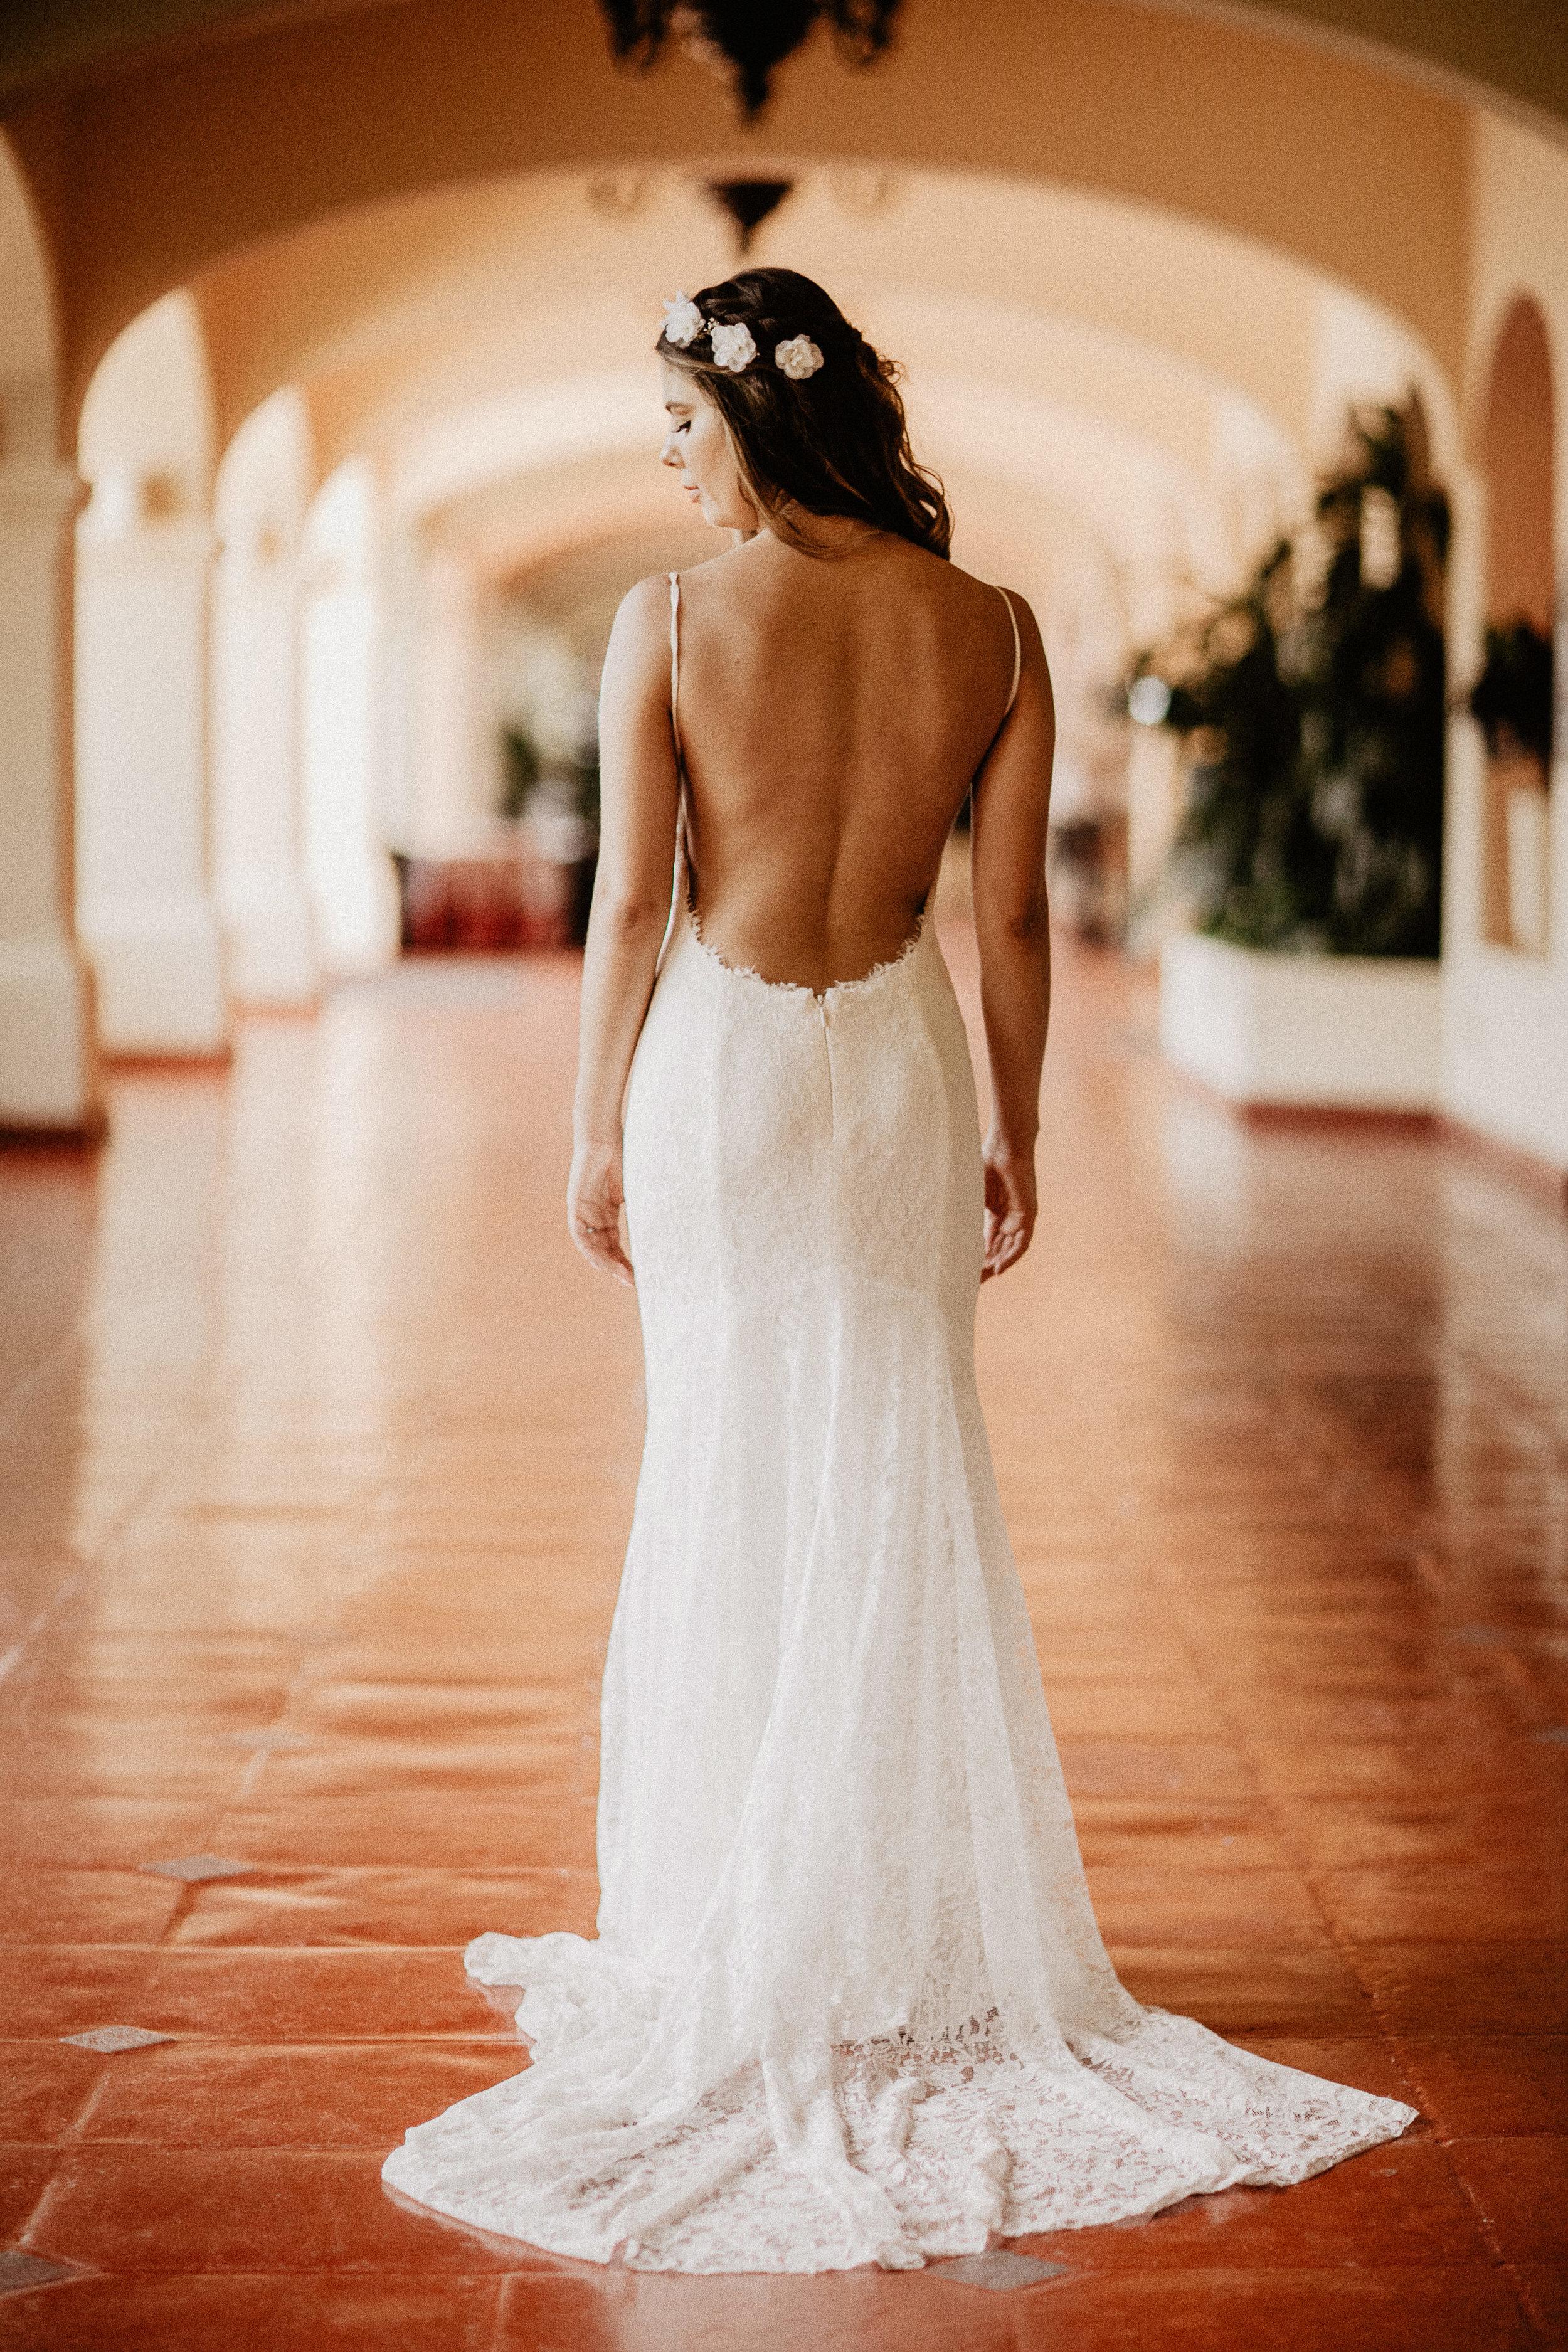 alfonso_flores_destination_wedding_photography_puerto_vallarta_hotel_barcelo_vallarta_cuttler_amela-328.JPG